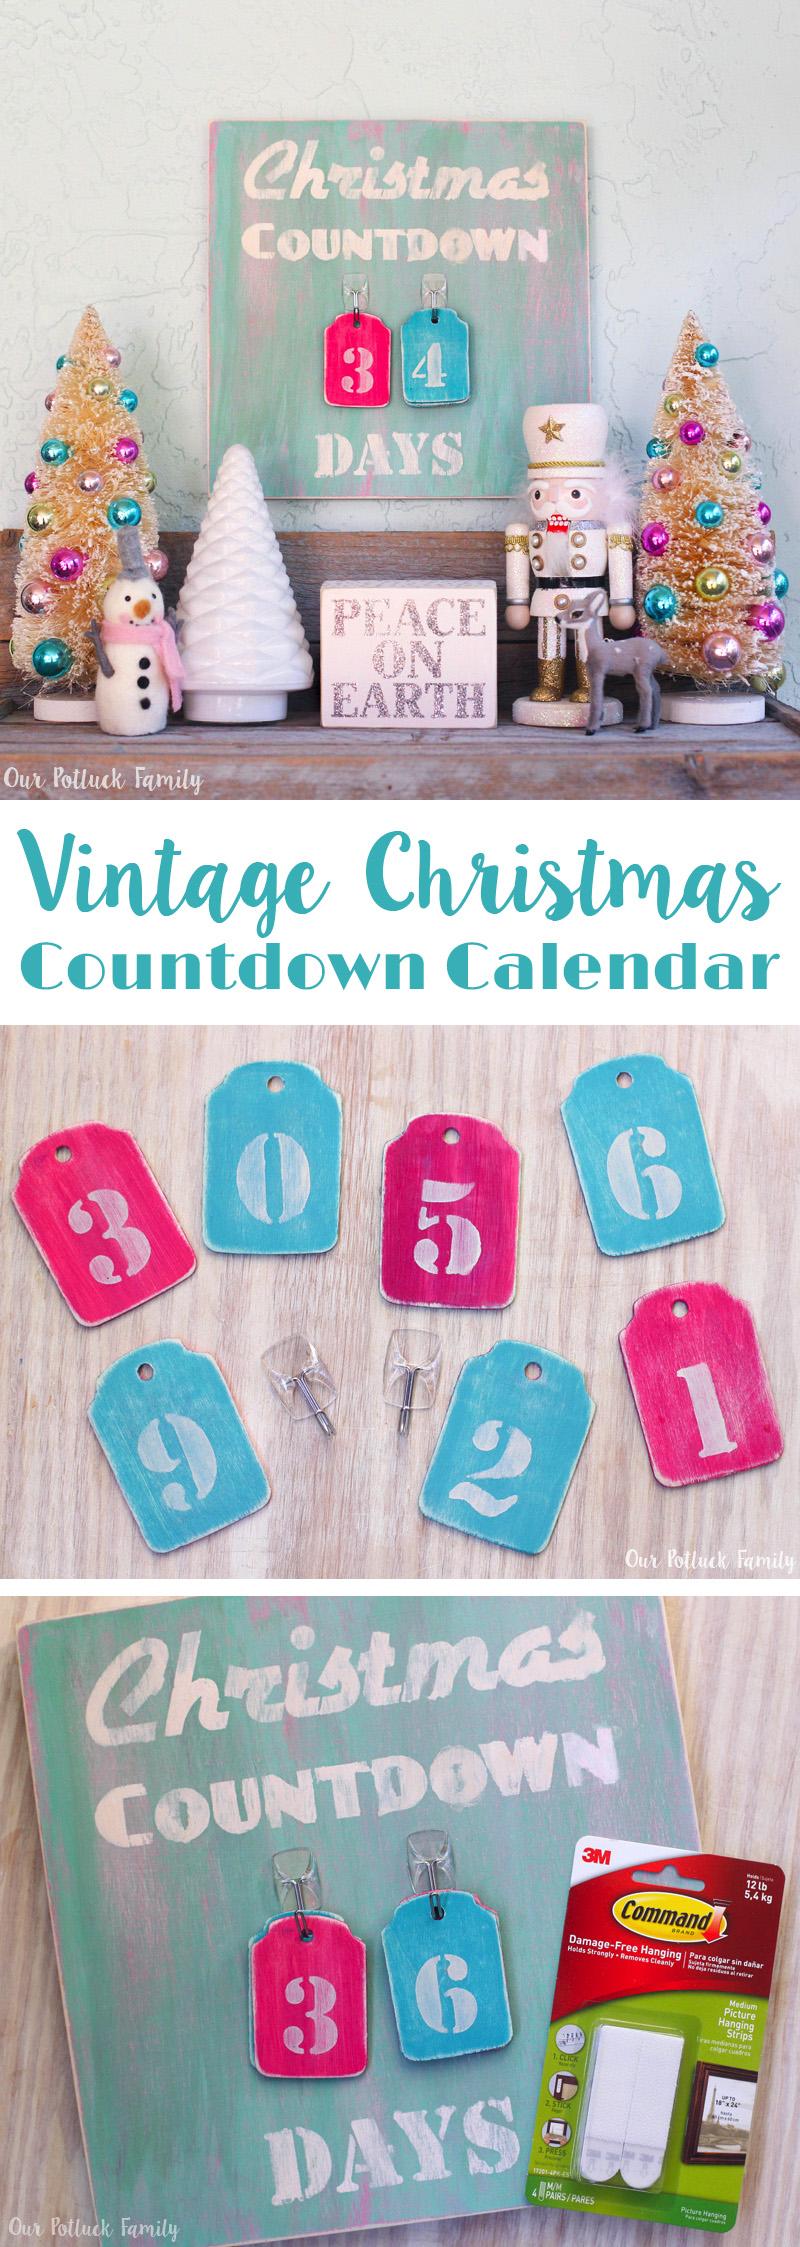 vintage-christmas-countdown-calendar